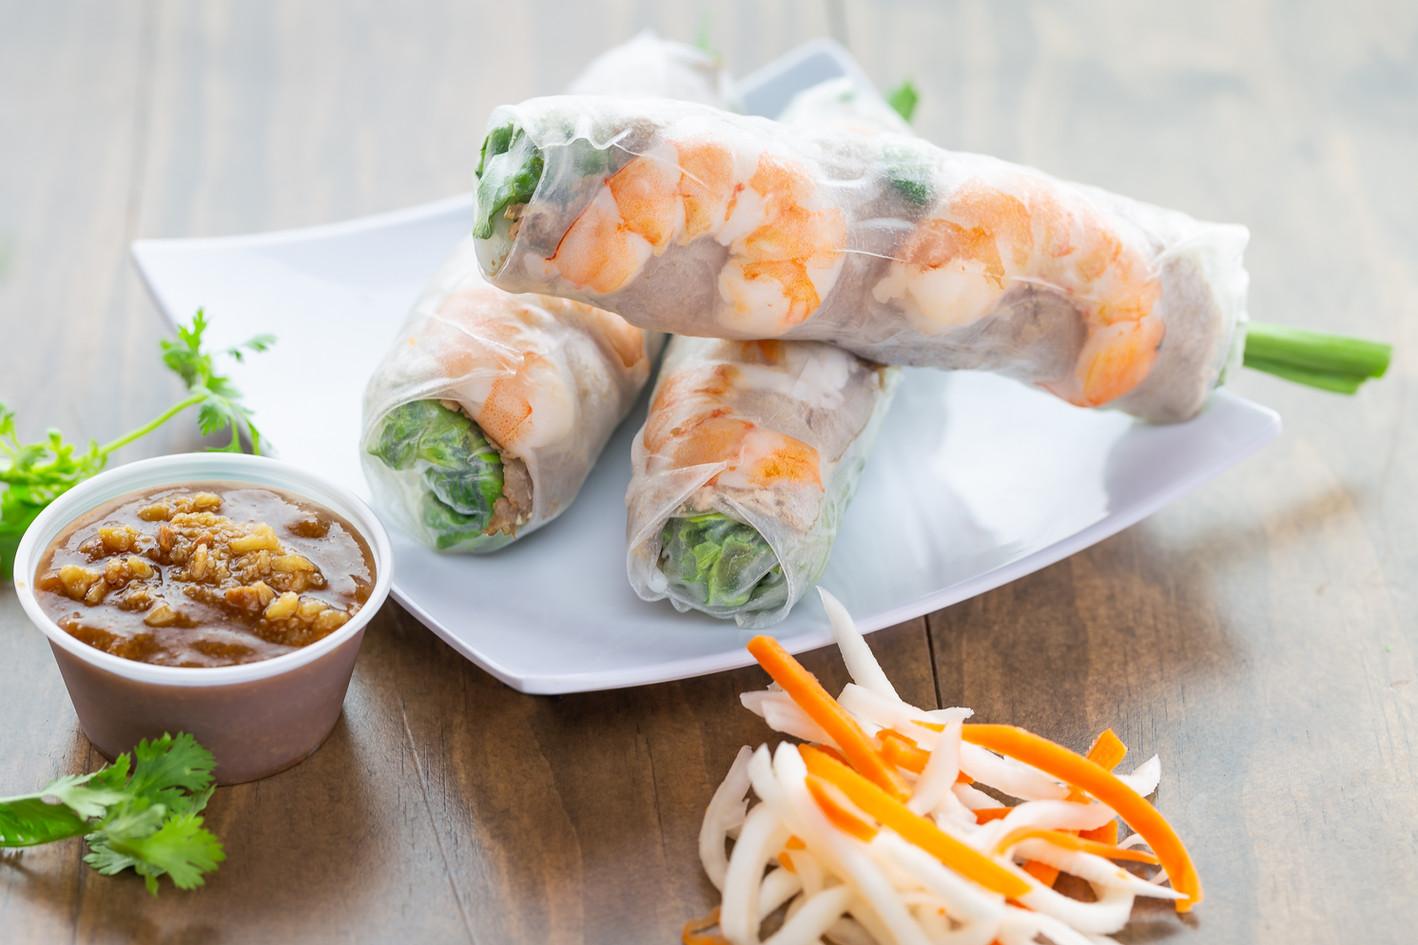 Gỏi Cuốn Tôm Thịt  Pork and Shrimp Sprin